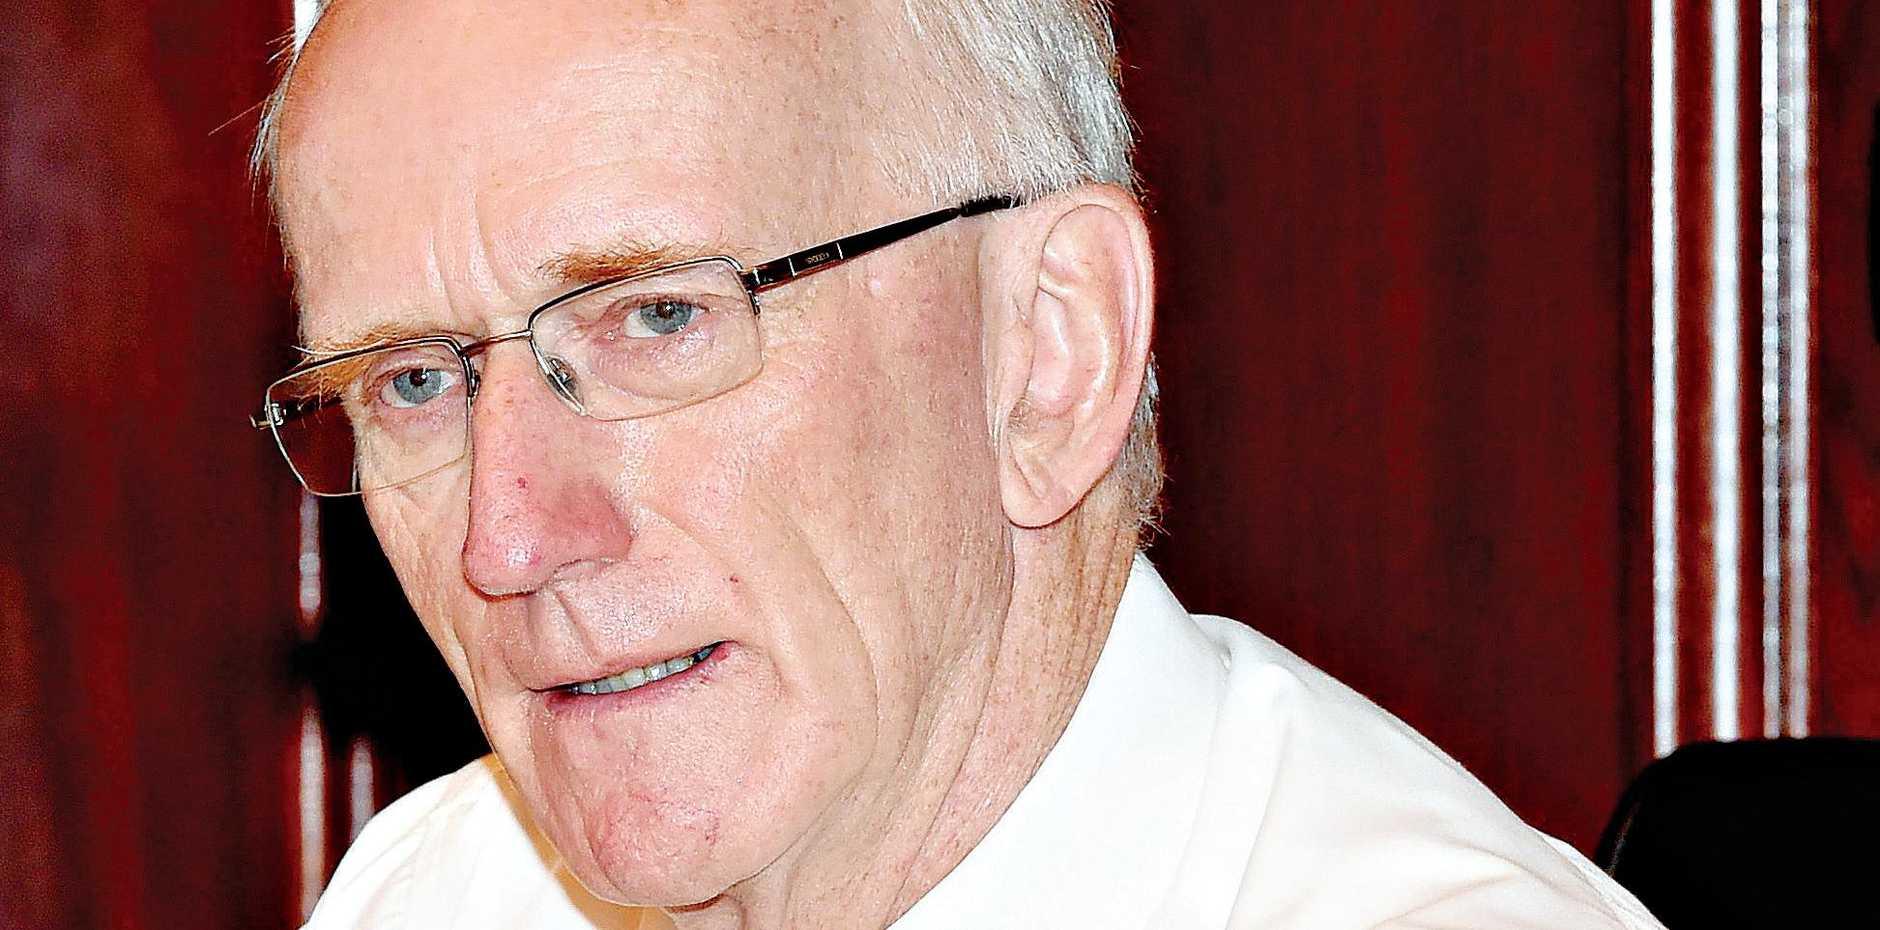 Under threat of sack: Mayor Chris Loft